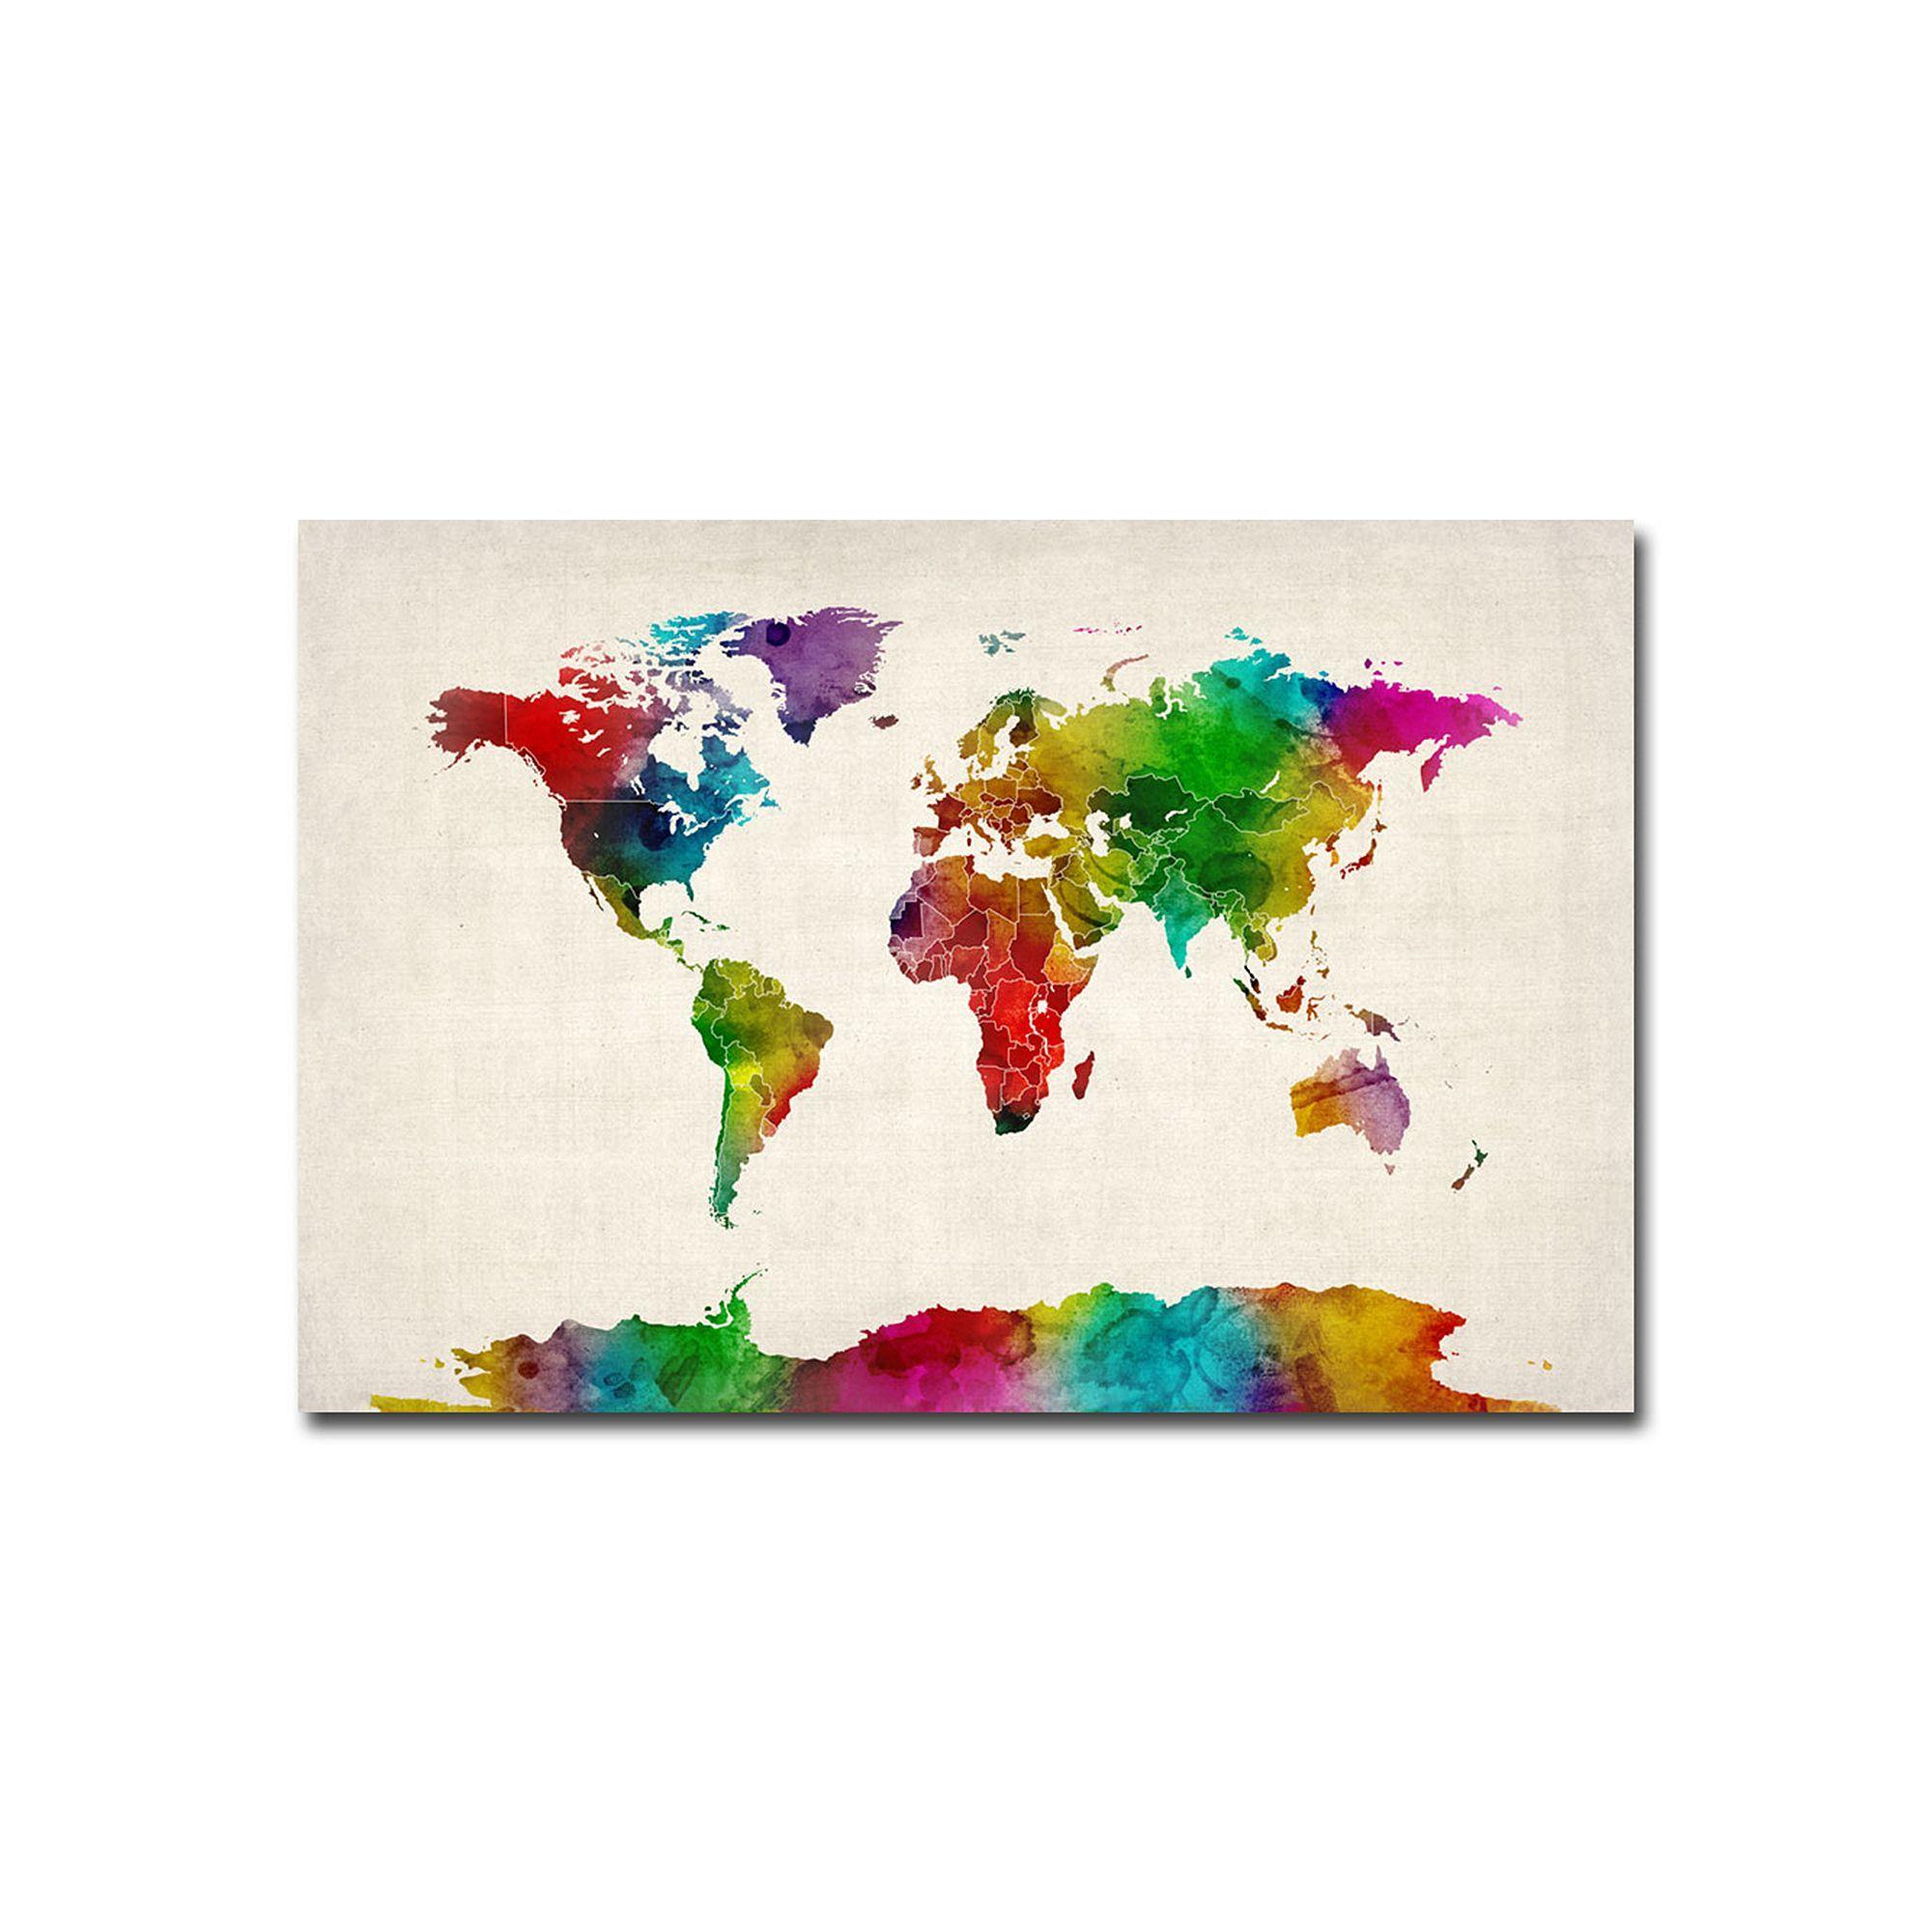 Kohls water color world map ii canvas wall art products kohls water color world map ii canvas wall art gumiabroncs Gallery